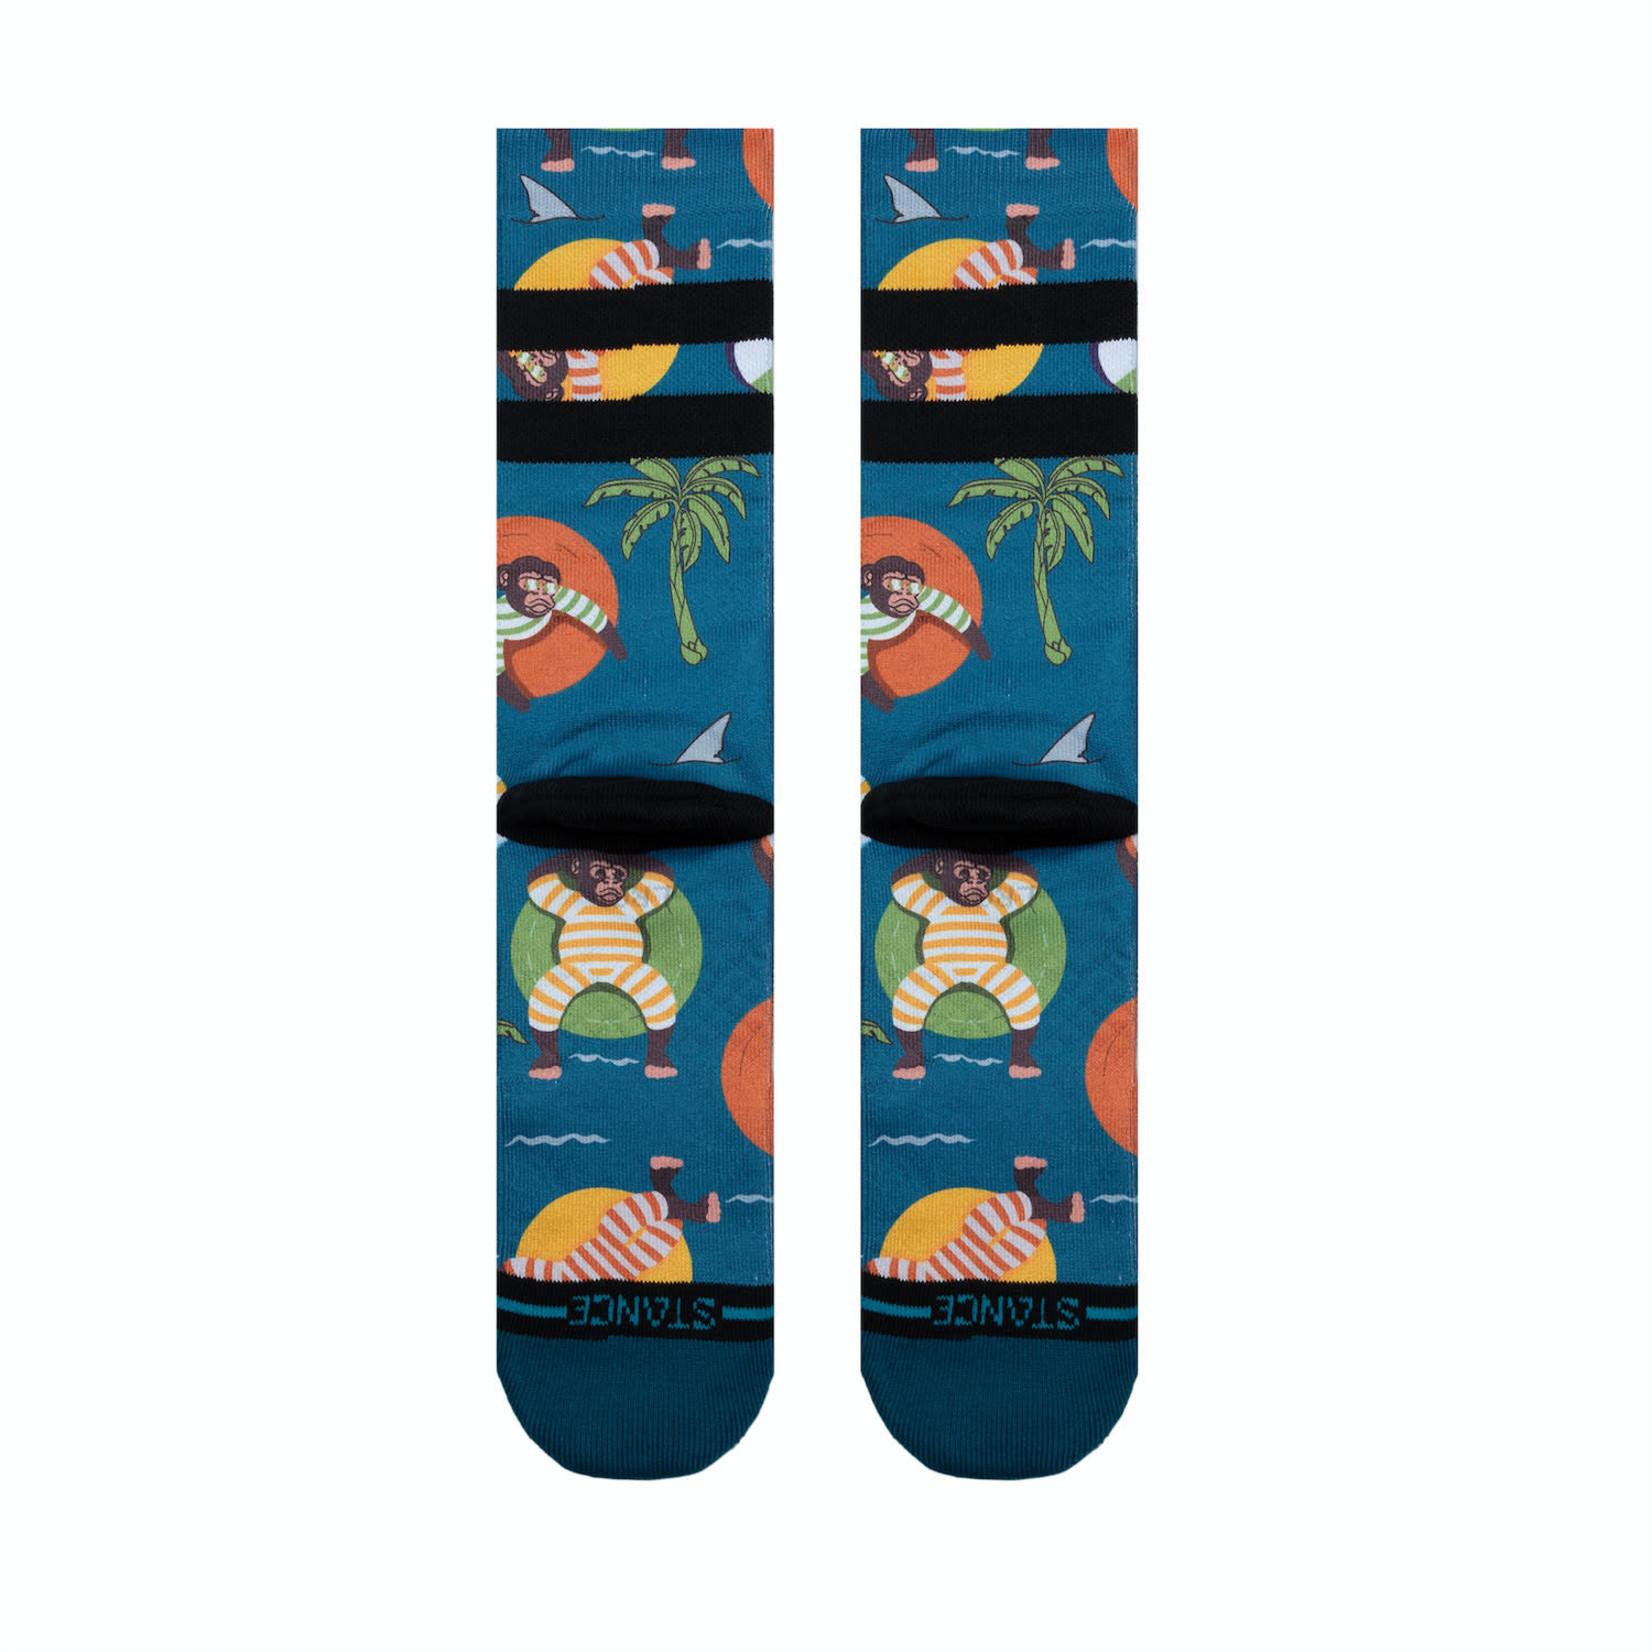 Stance Stance Socks Monkey Chillin L (Men 9-13 / Women 11-14)